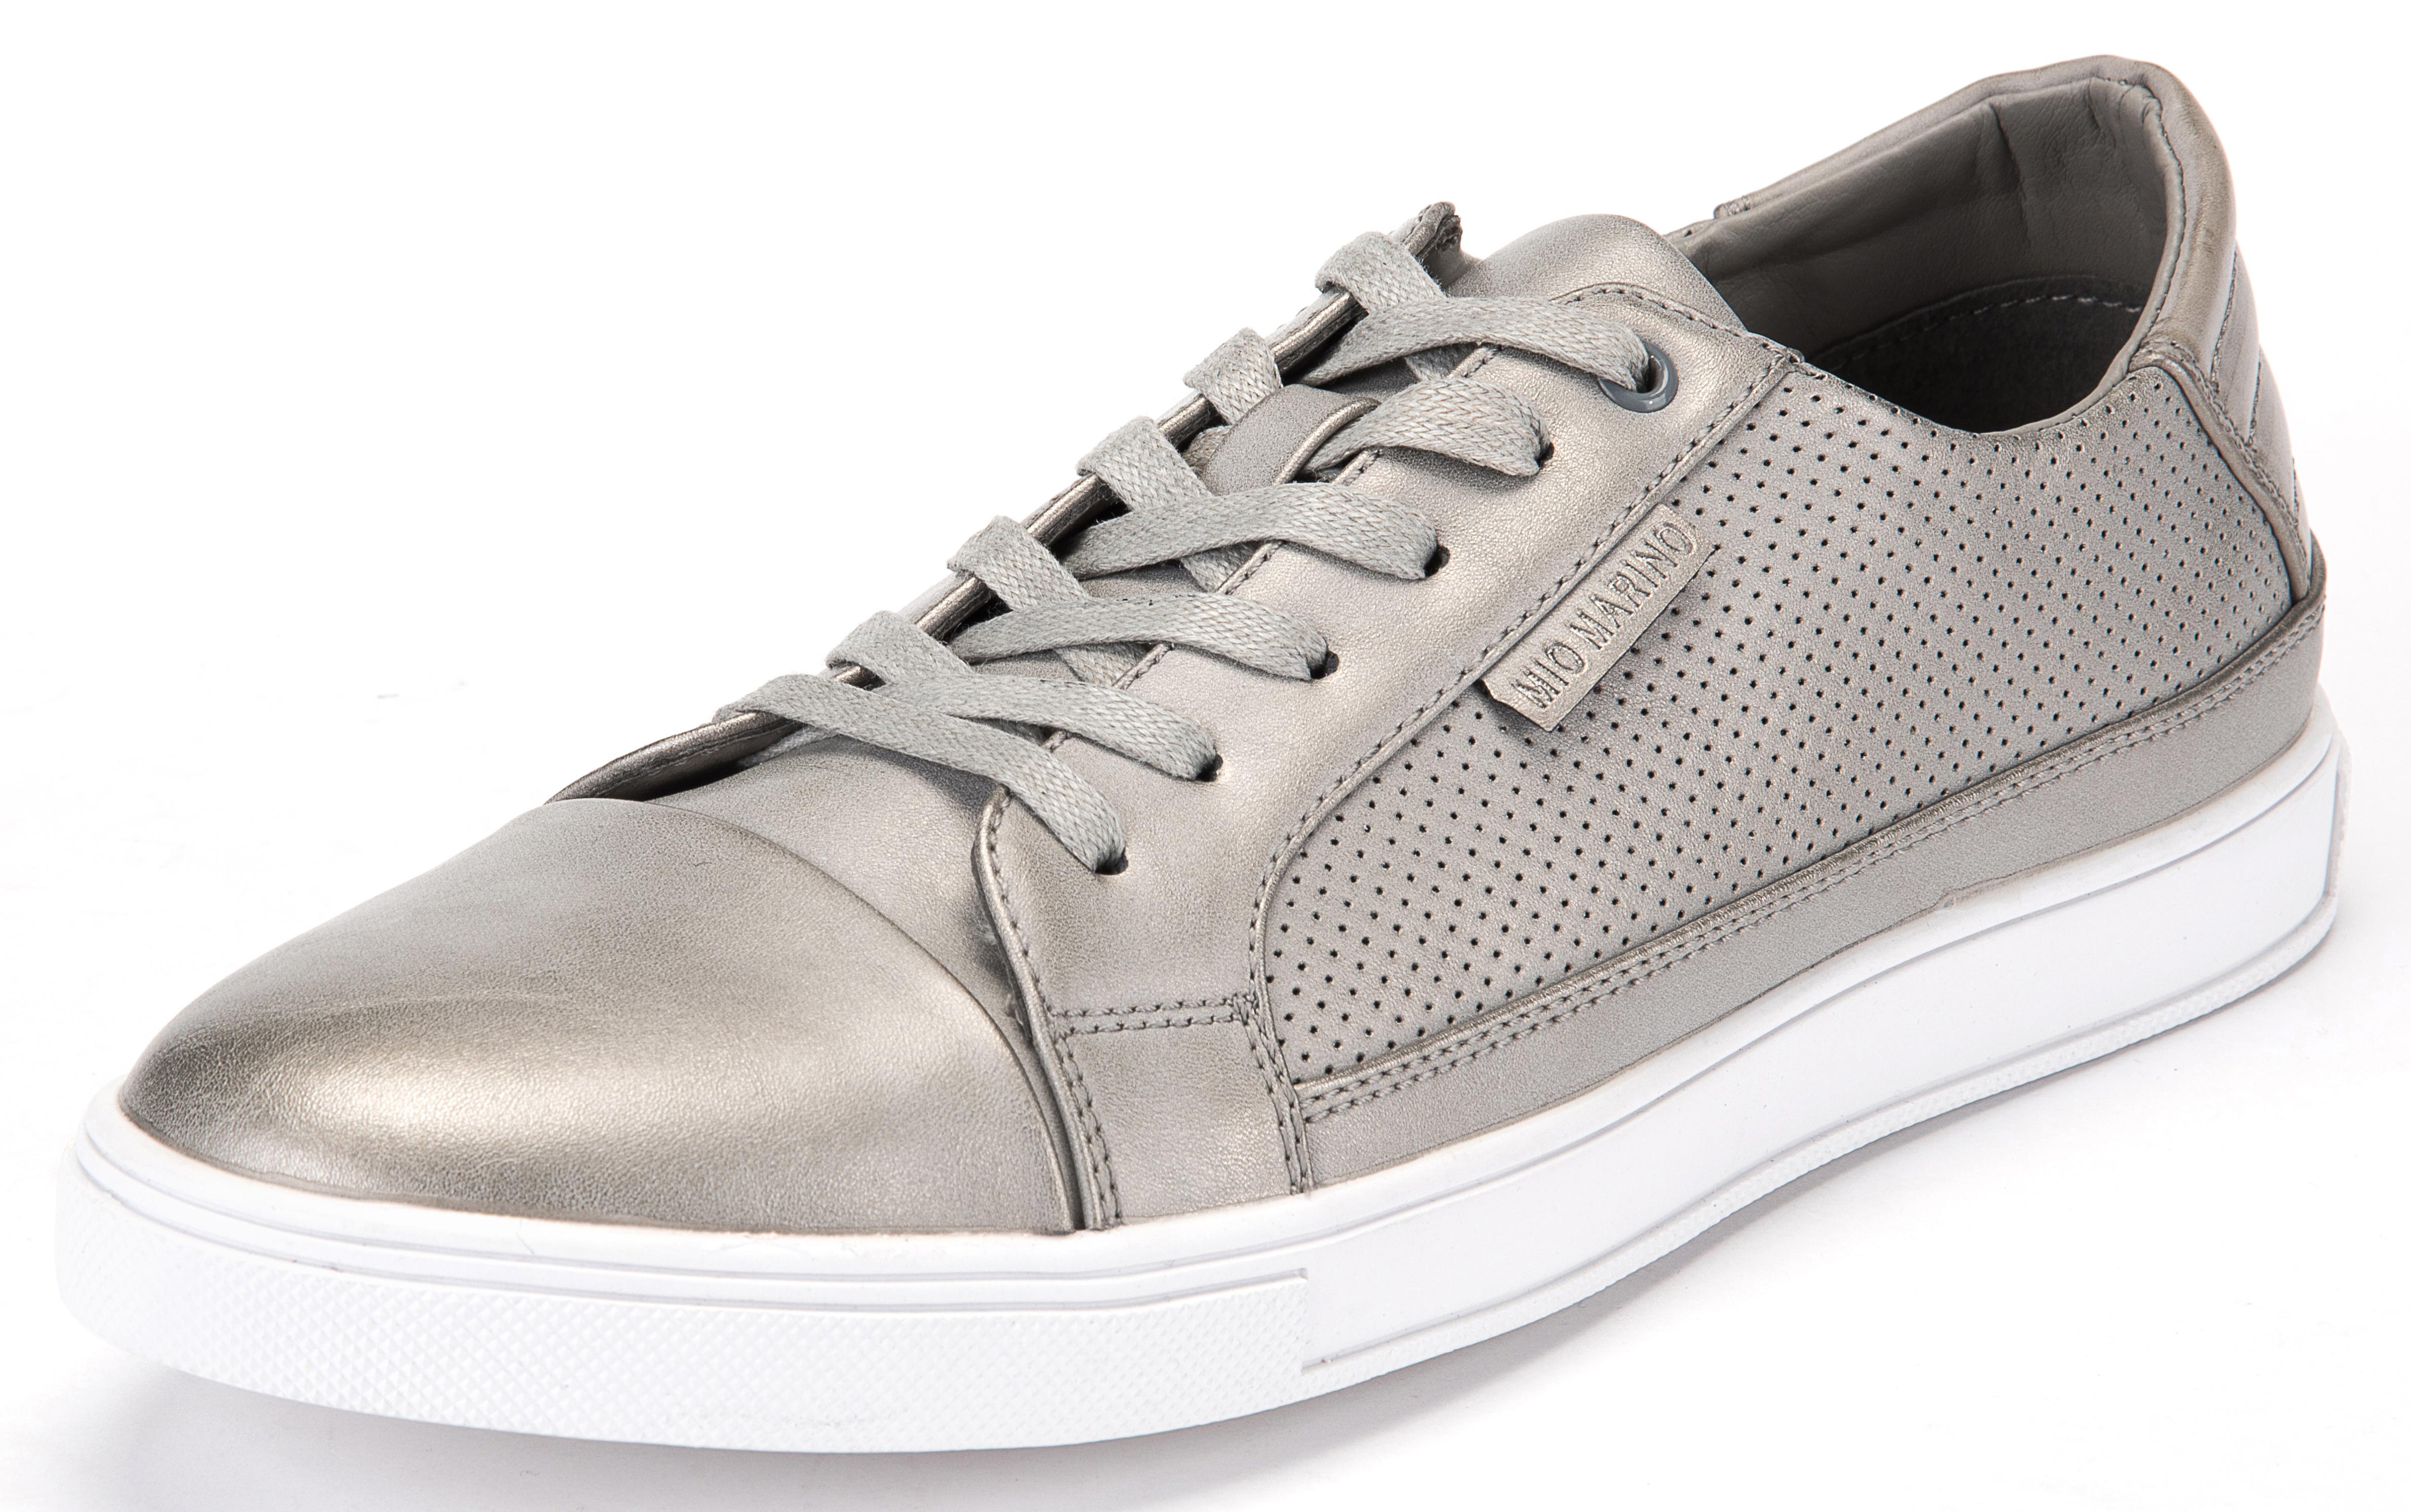 Dappled Lace Fashion Sneakers Gray | Trada Marketplace